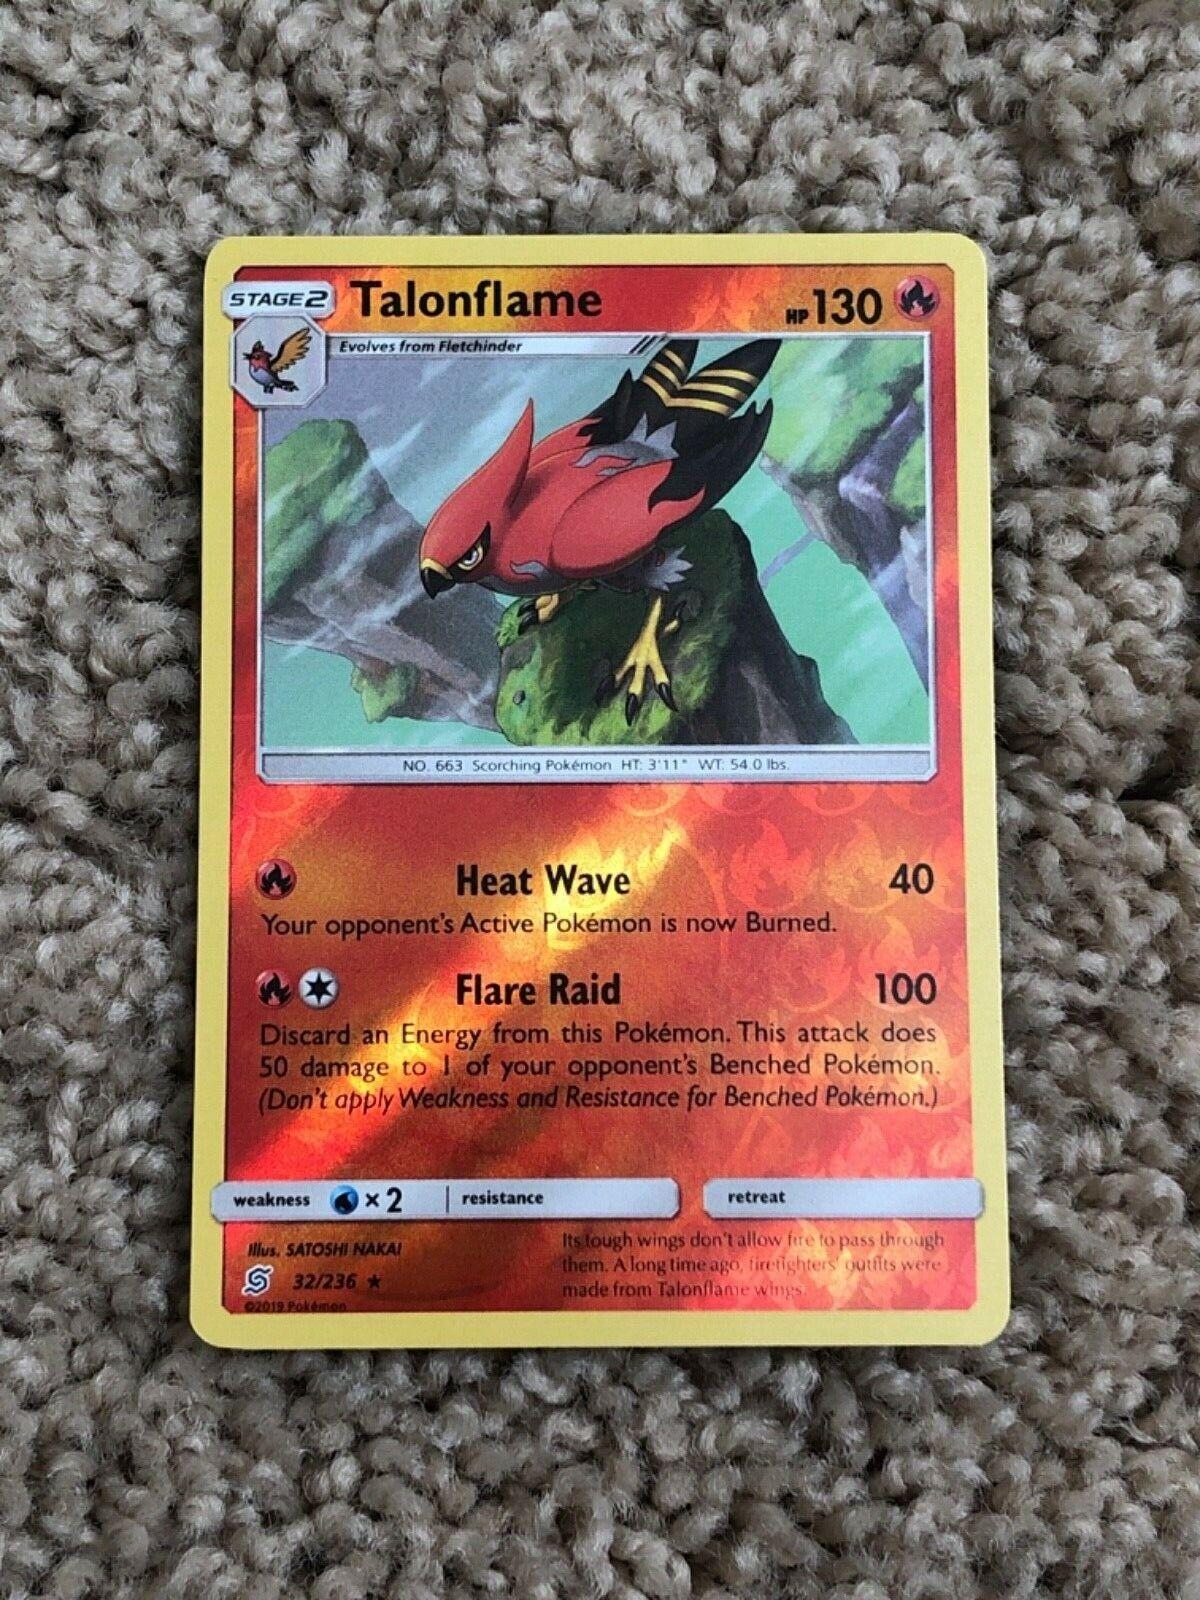 Talonflame - 32/236 Reverse Holo Foil Pokemon Card Unified Minds